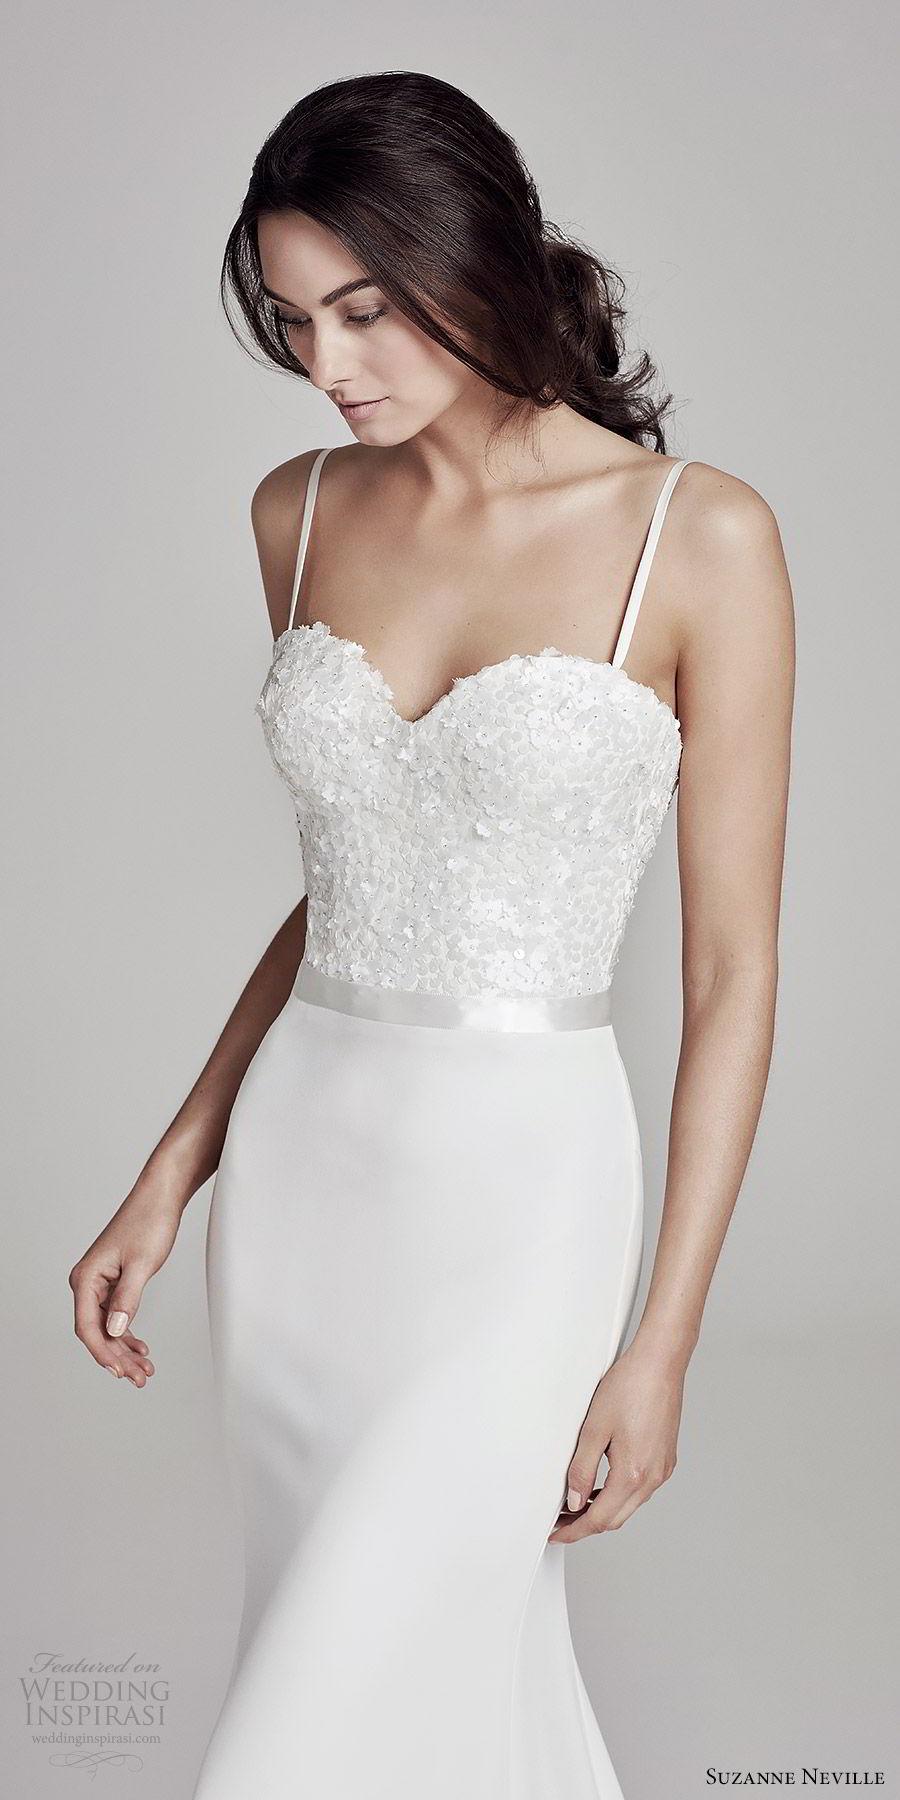 suzanne neville bridal 2019 sleeveless thin straps sweetheart embellished bodice sheath wedding dress (bronte) chapel train elegant chic zv